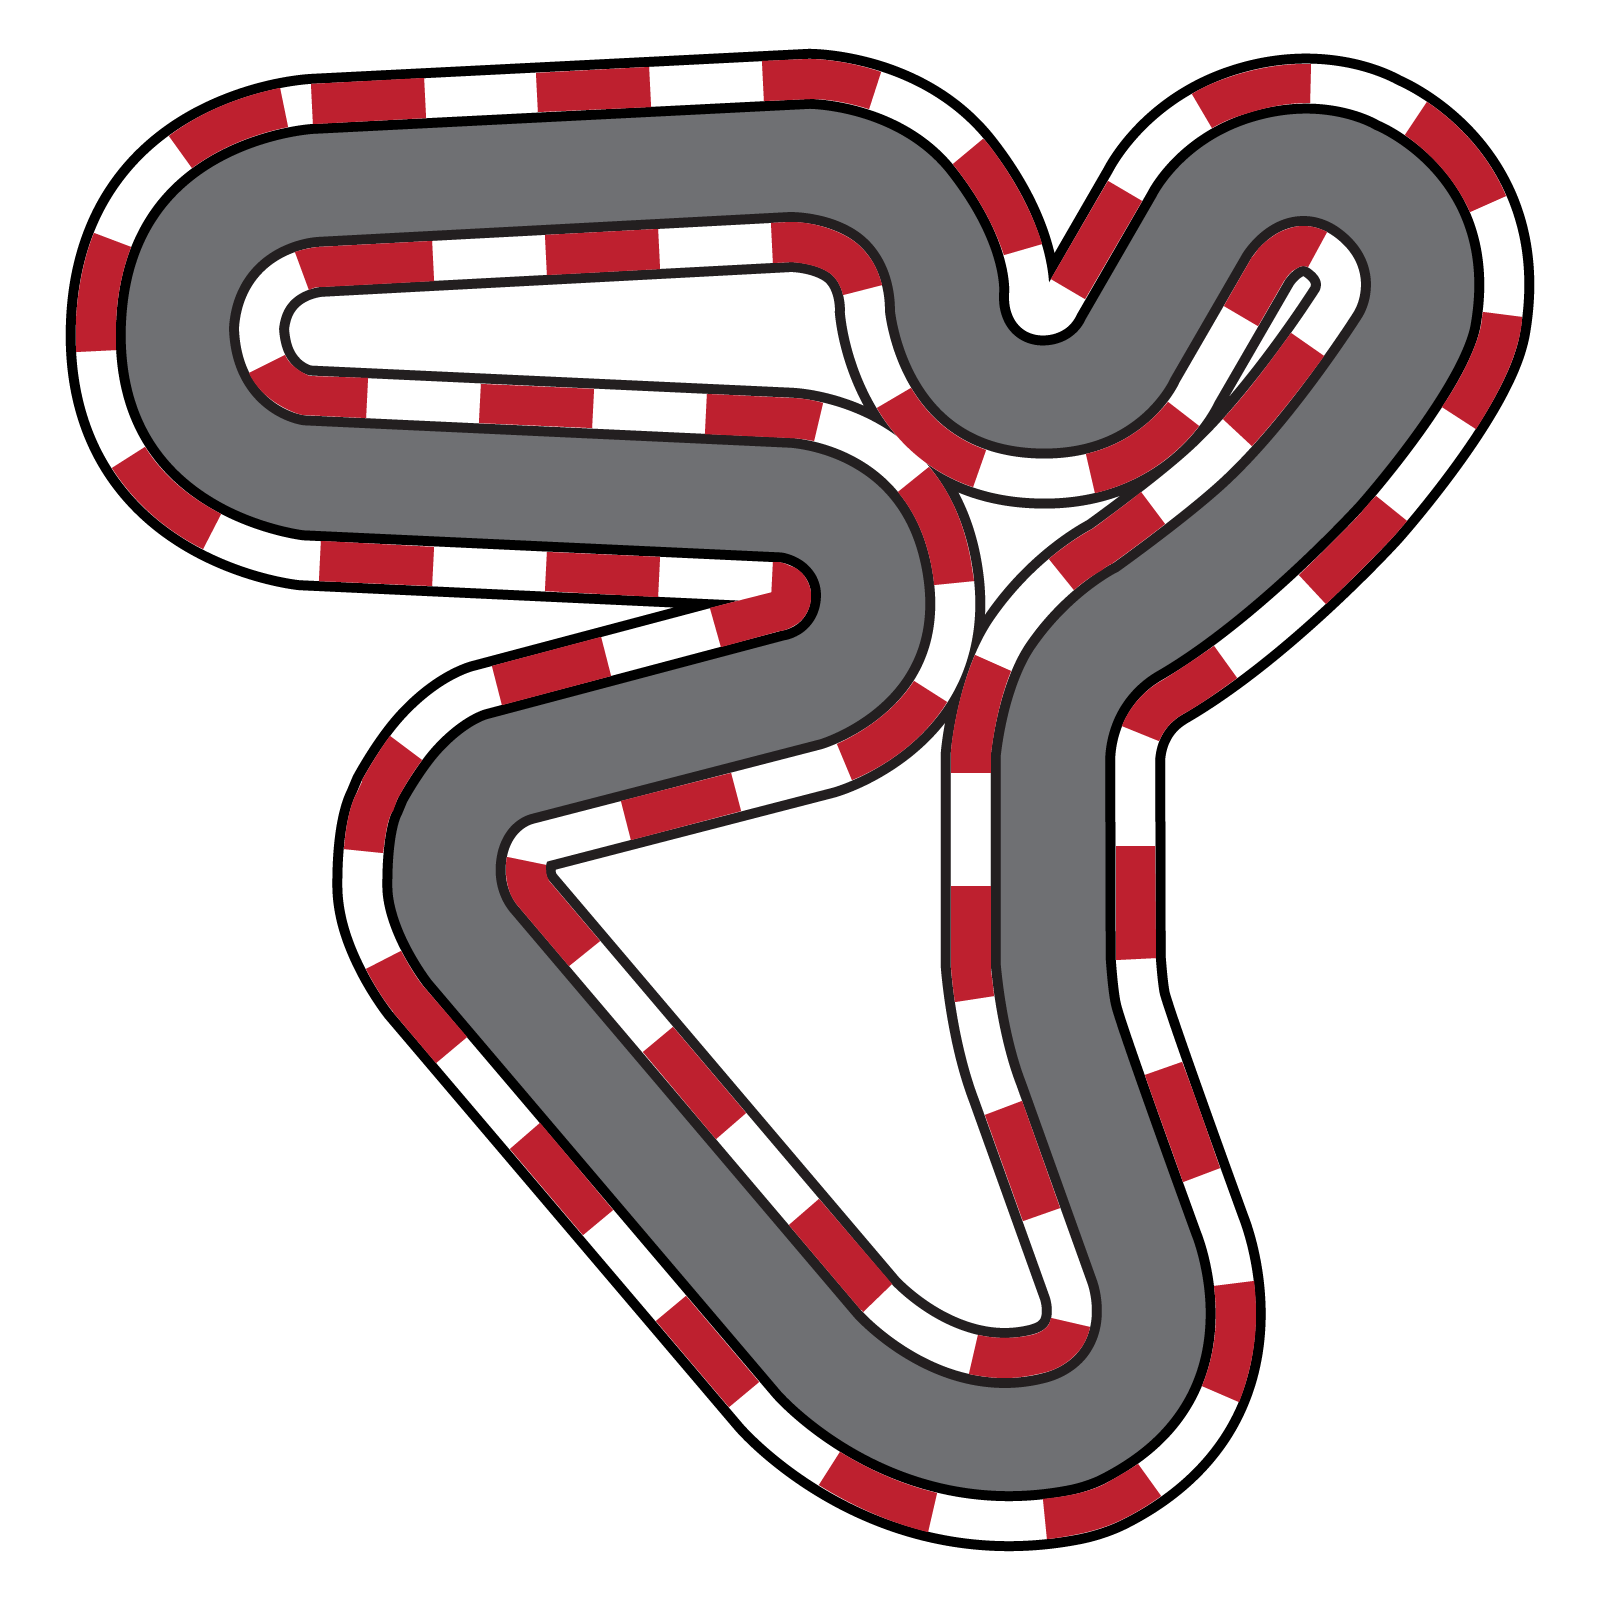 Clipart cars racetrack, Clipart cars racetrack Transparent.